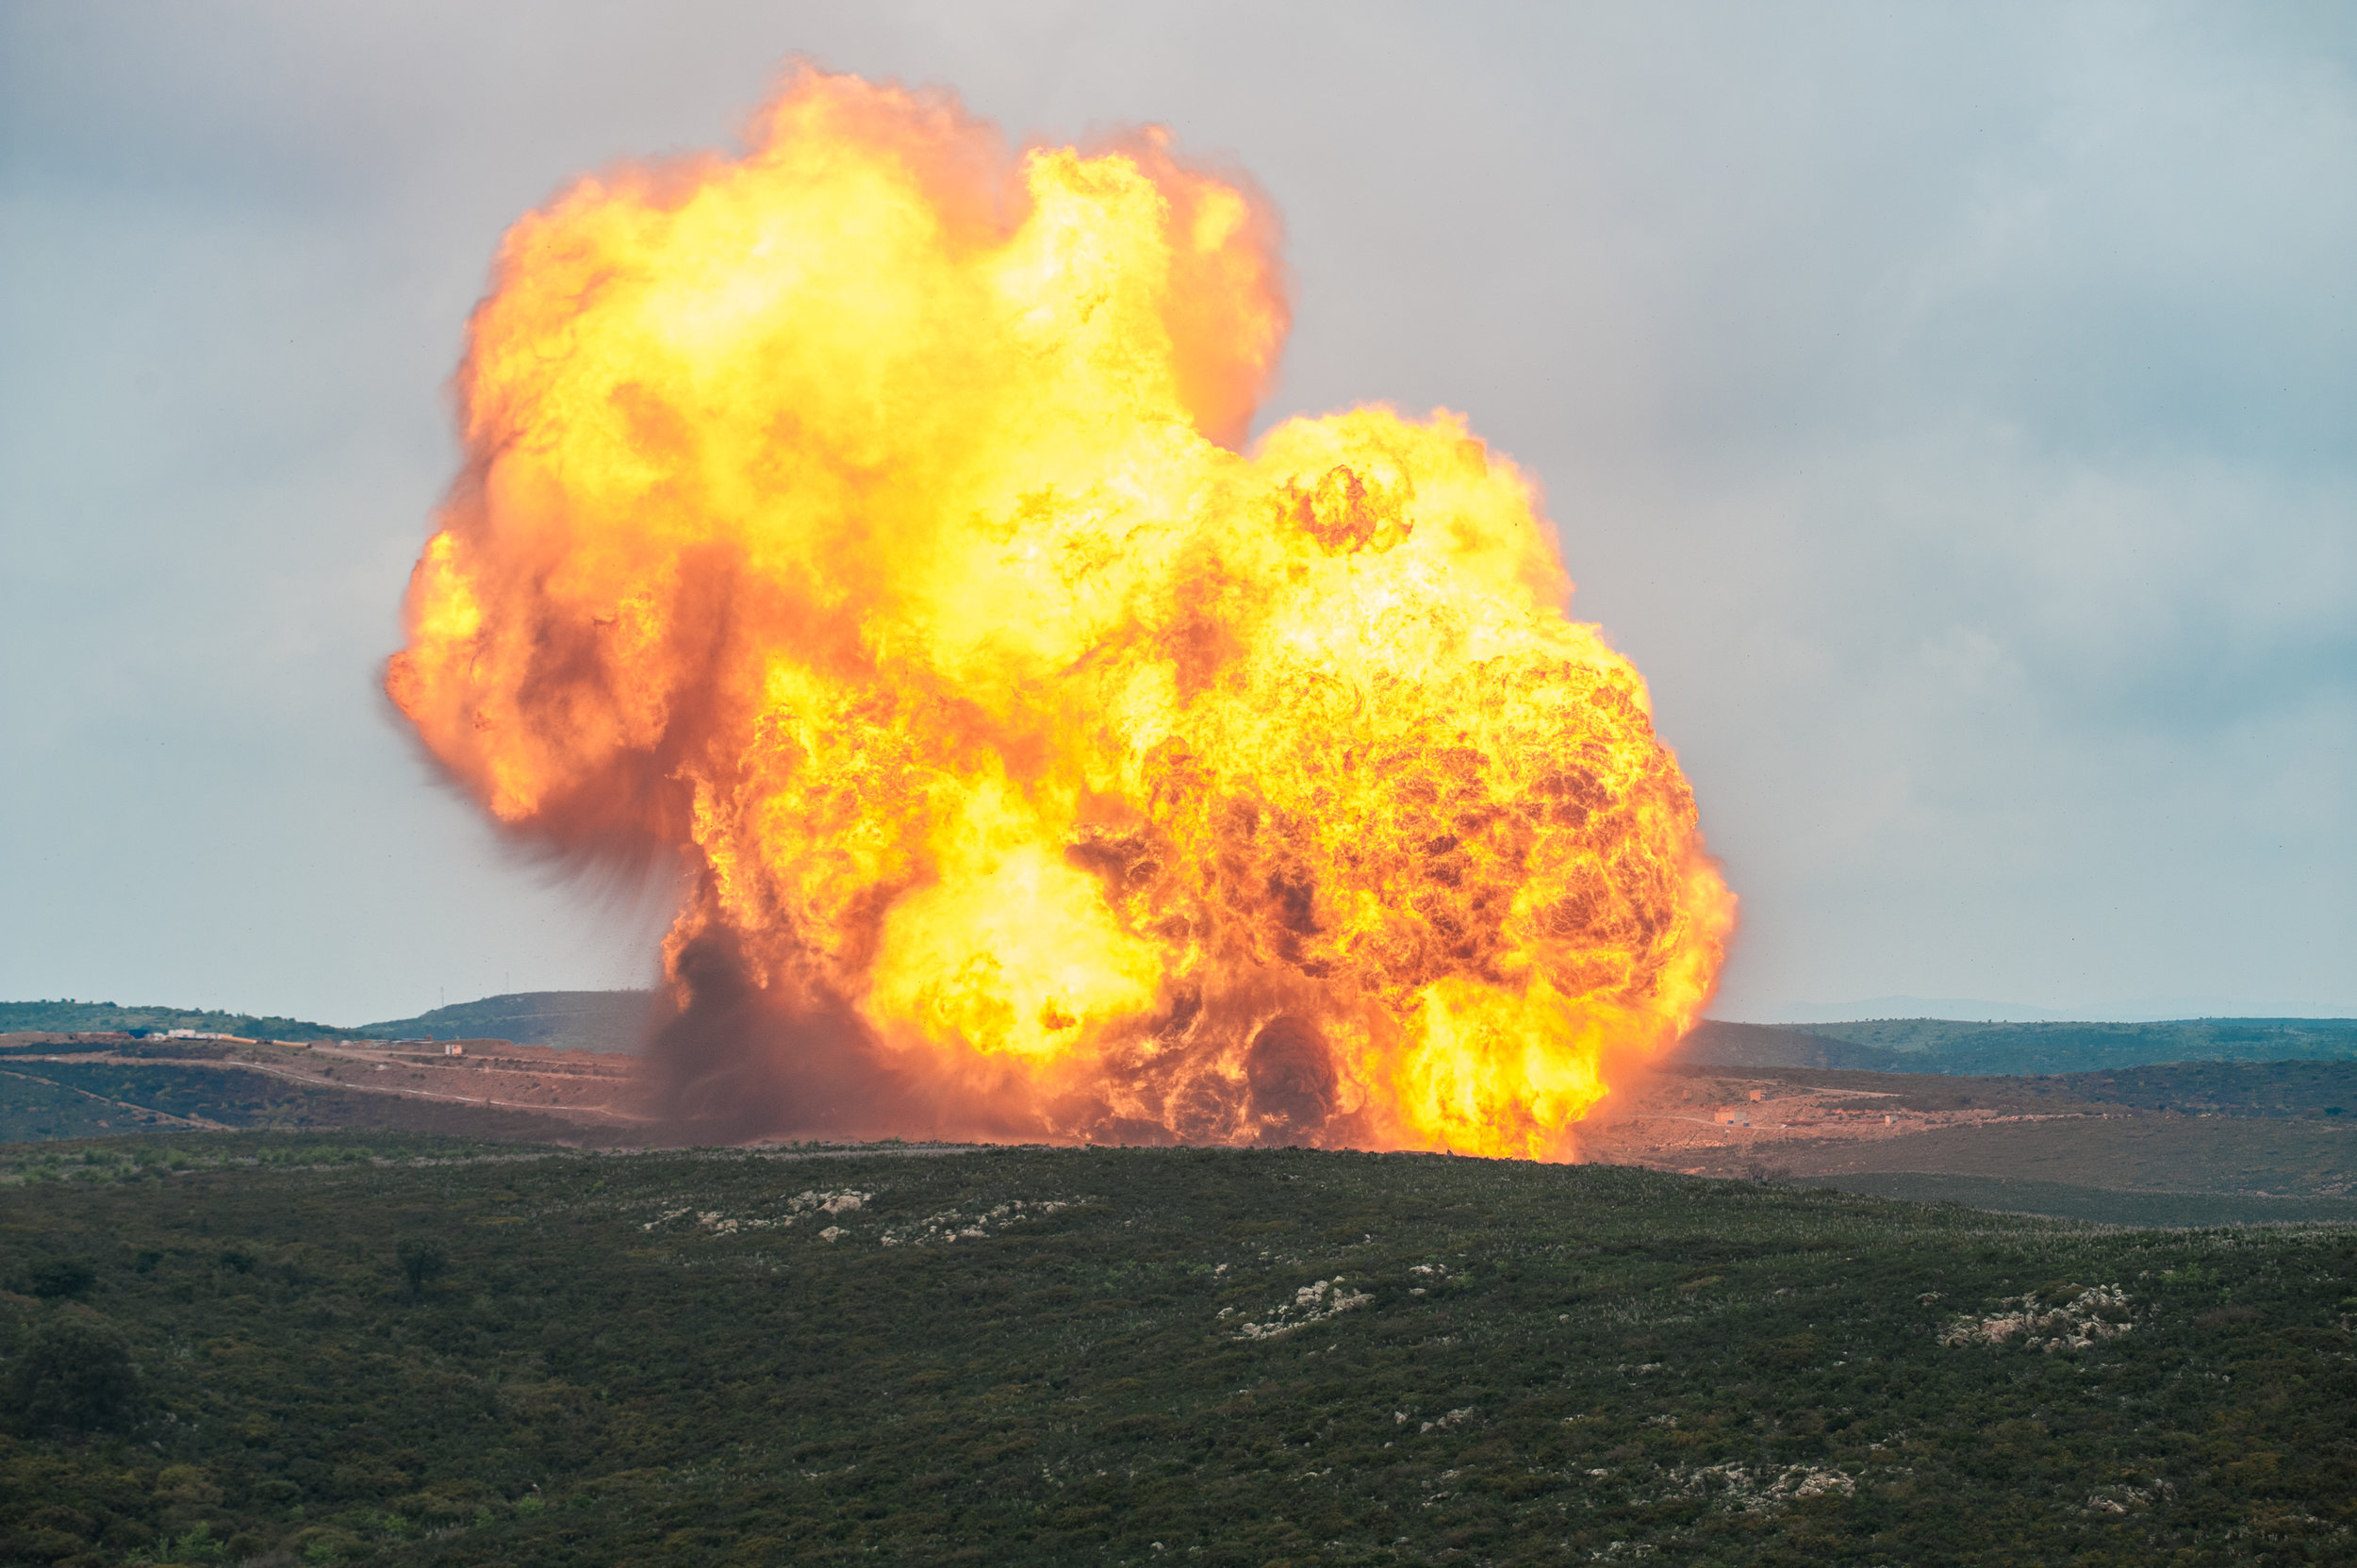 fn csm esplosione-030.jpg